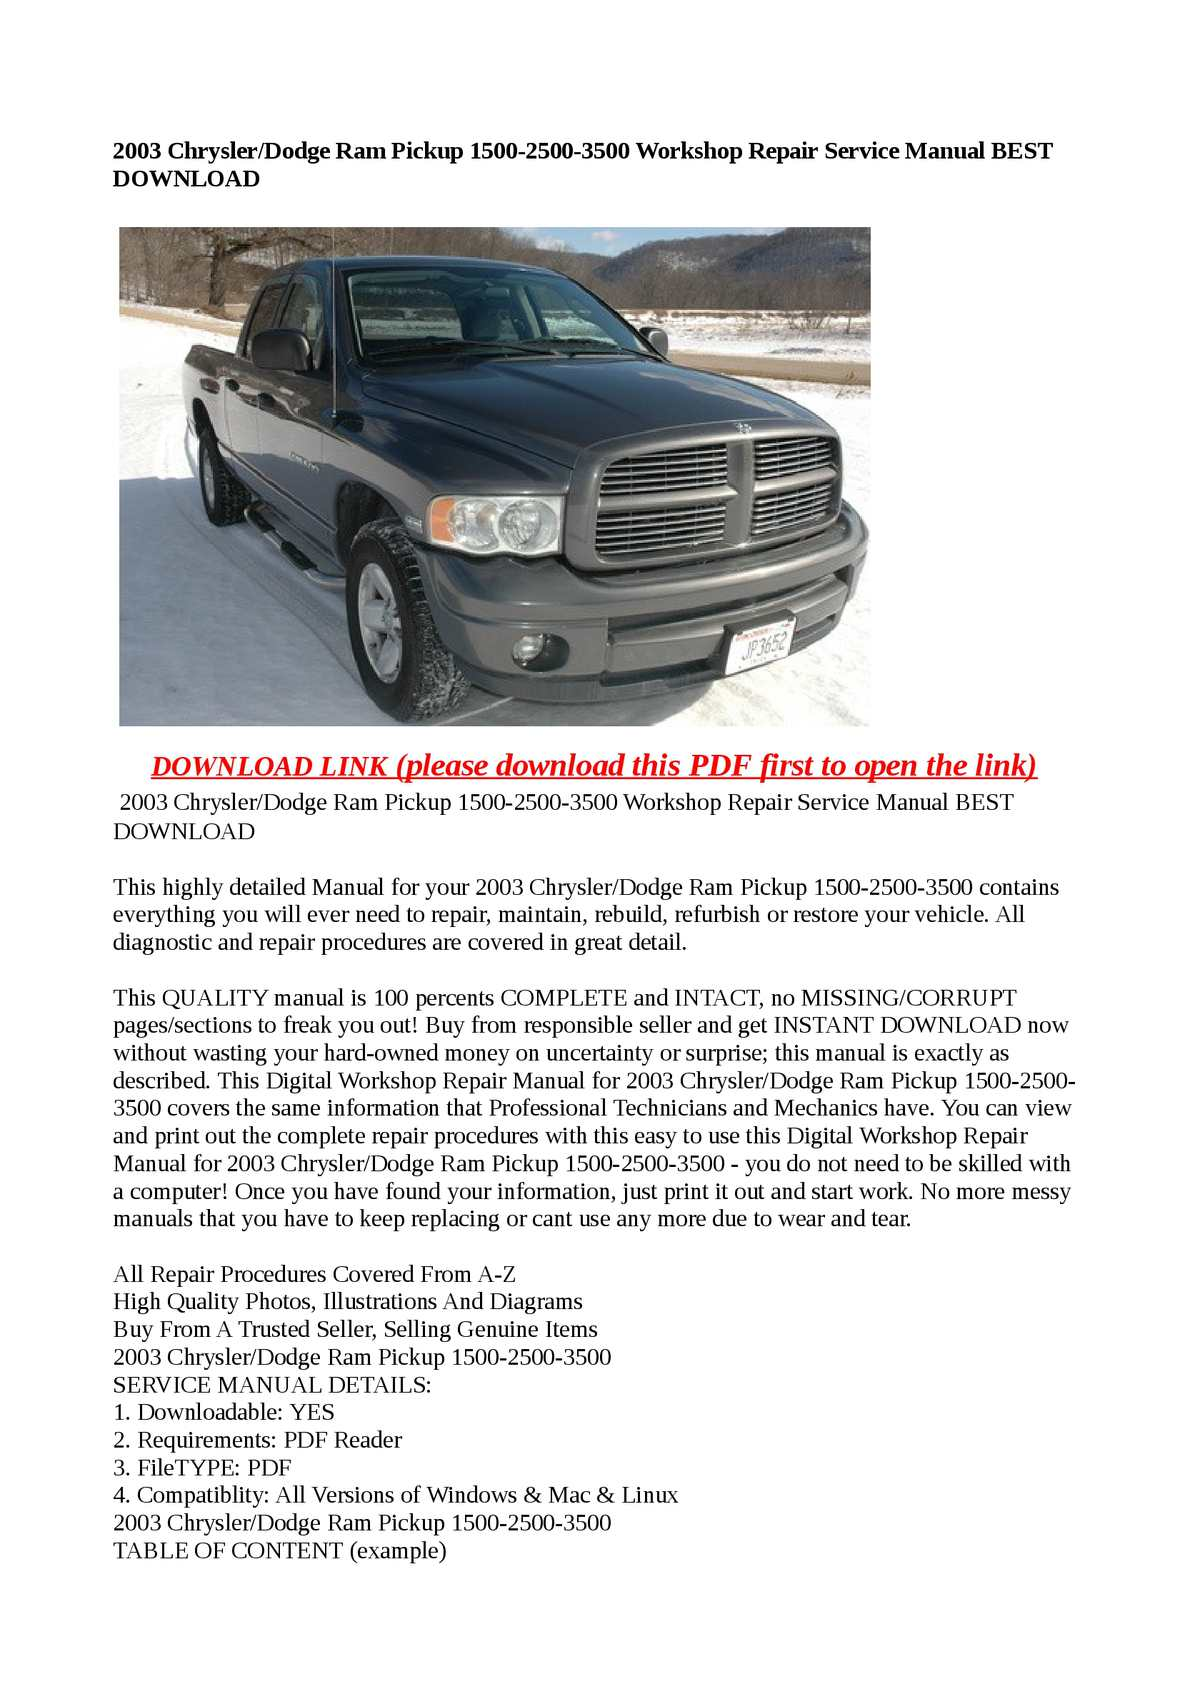 Calaméo - 2003 Chrysler/Dodge Ram Pickup 1500-2500-3500 Workshop Repair  Service Manual BEST DOWNLOAD